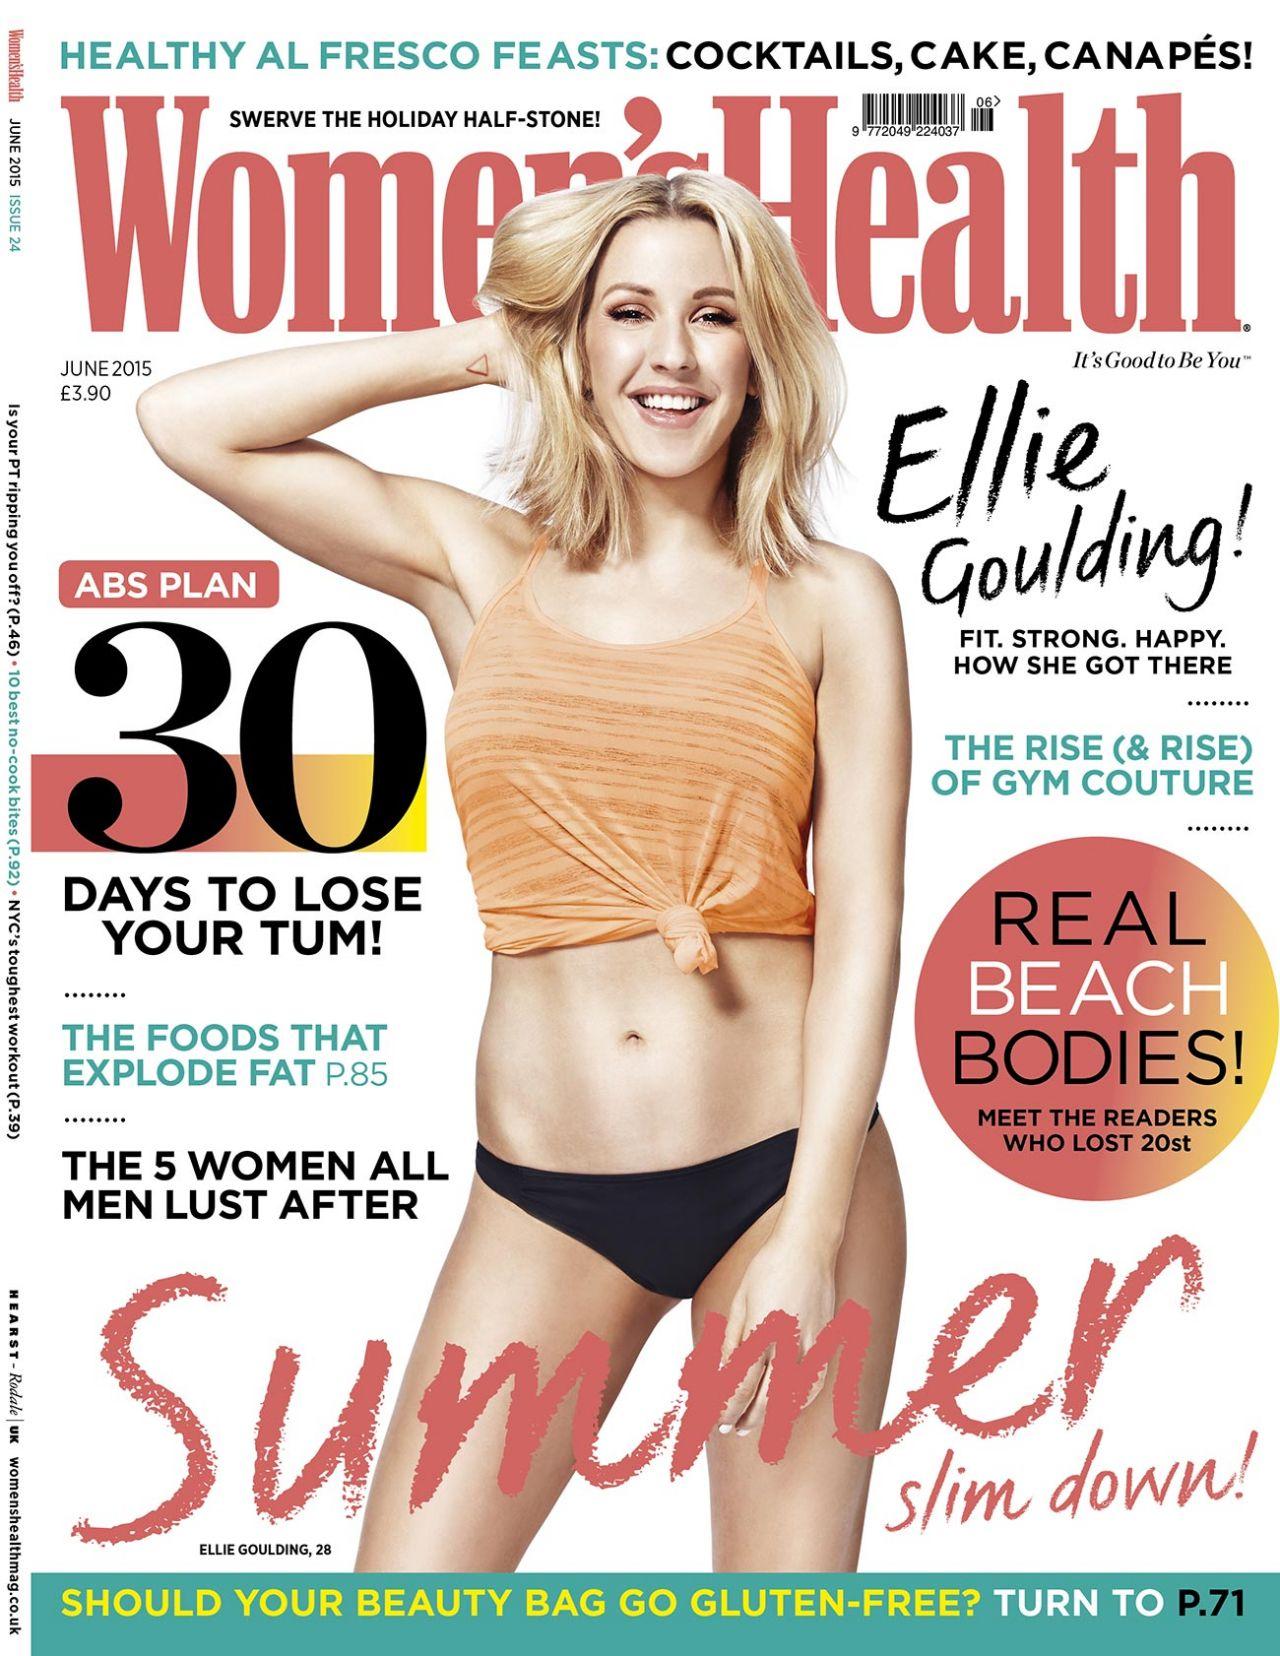 Galería » Portadas, photoshoots, candids. - Página 2 Ellie-goulding-women-s-health-magazine-uk-may-2015-issue_3